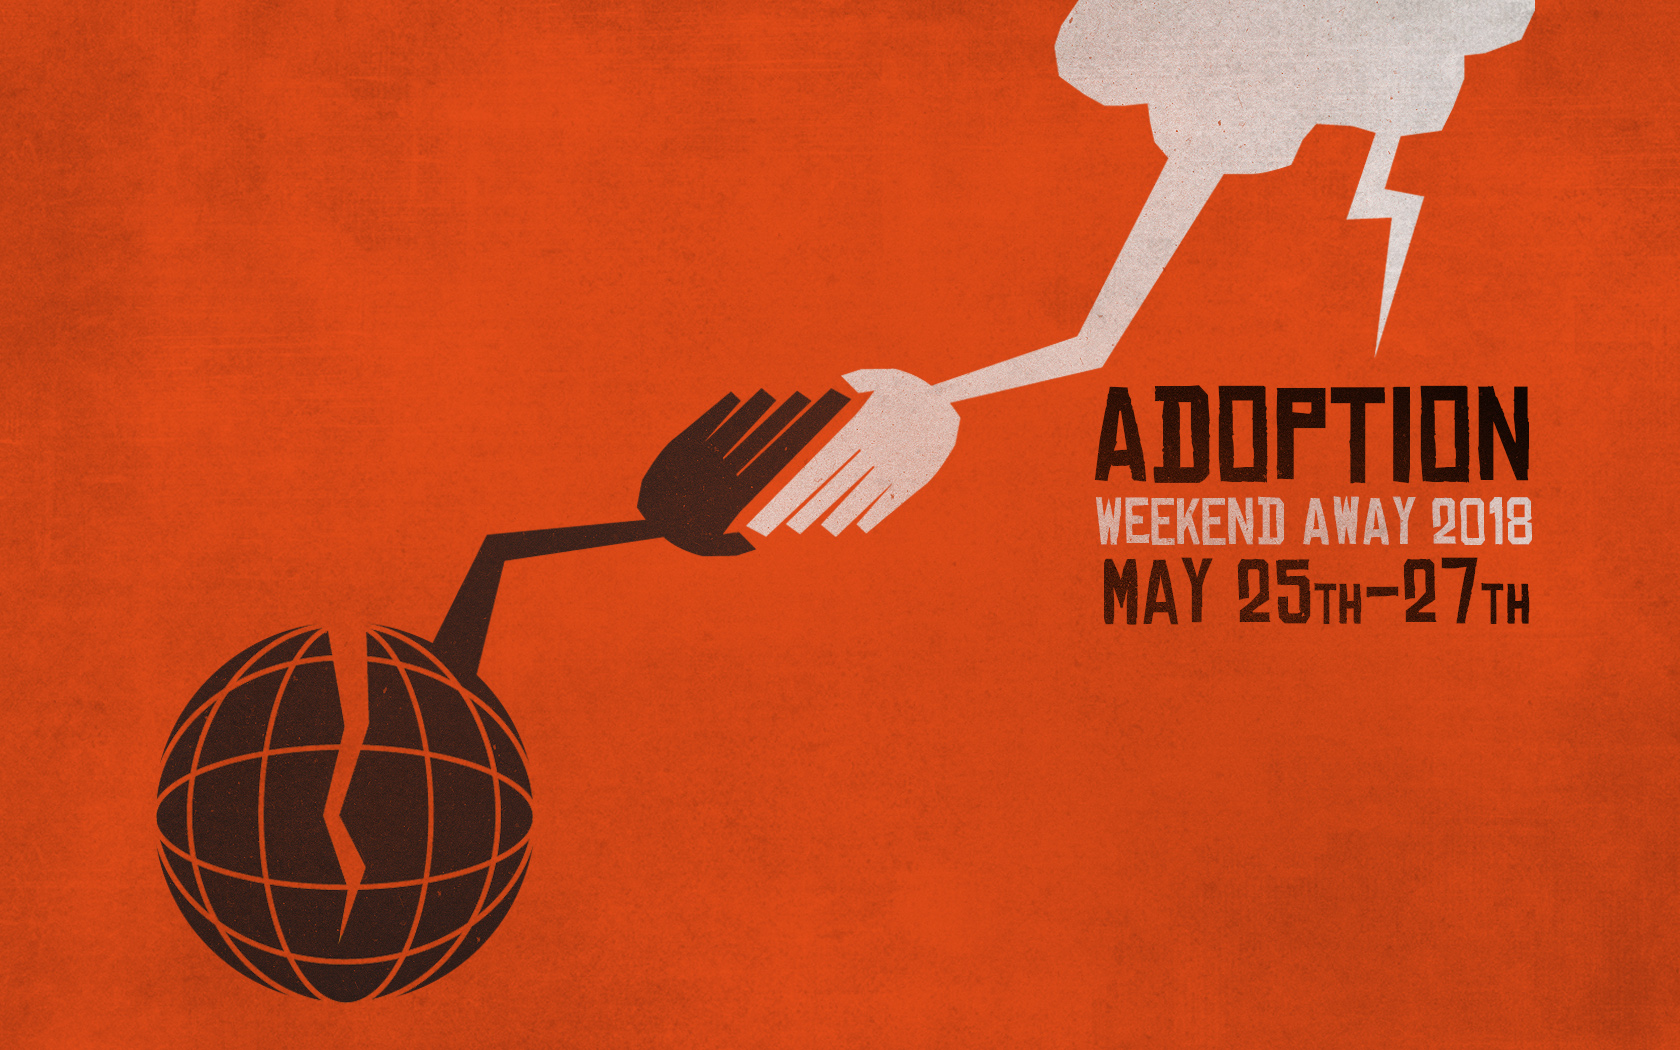 Adoption Title.jpg